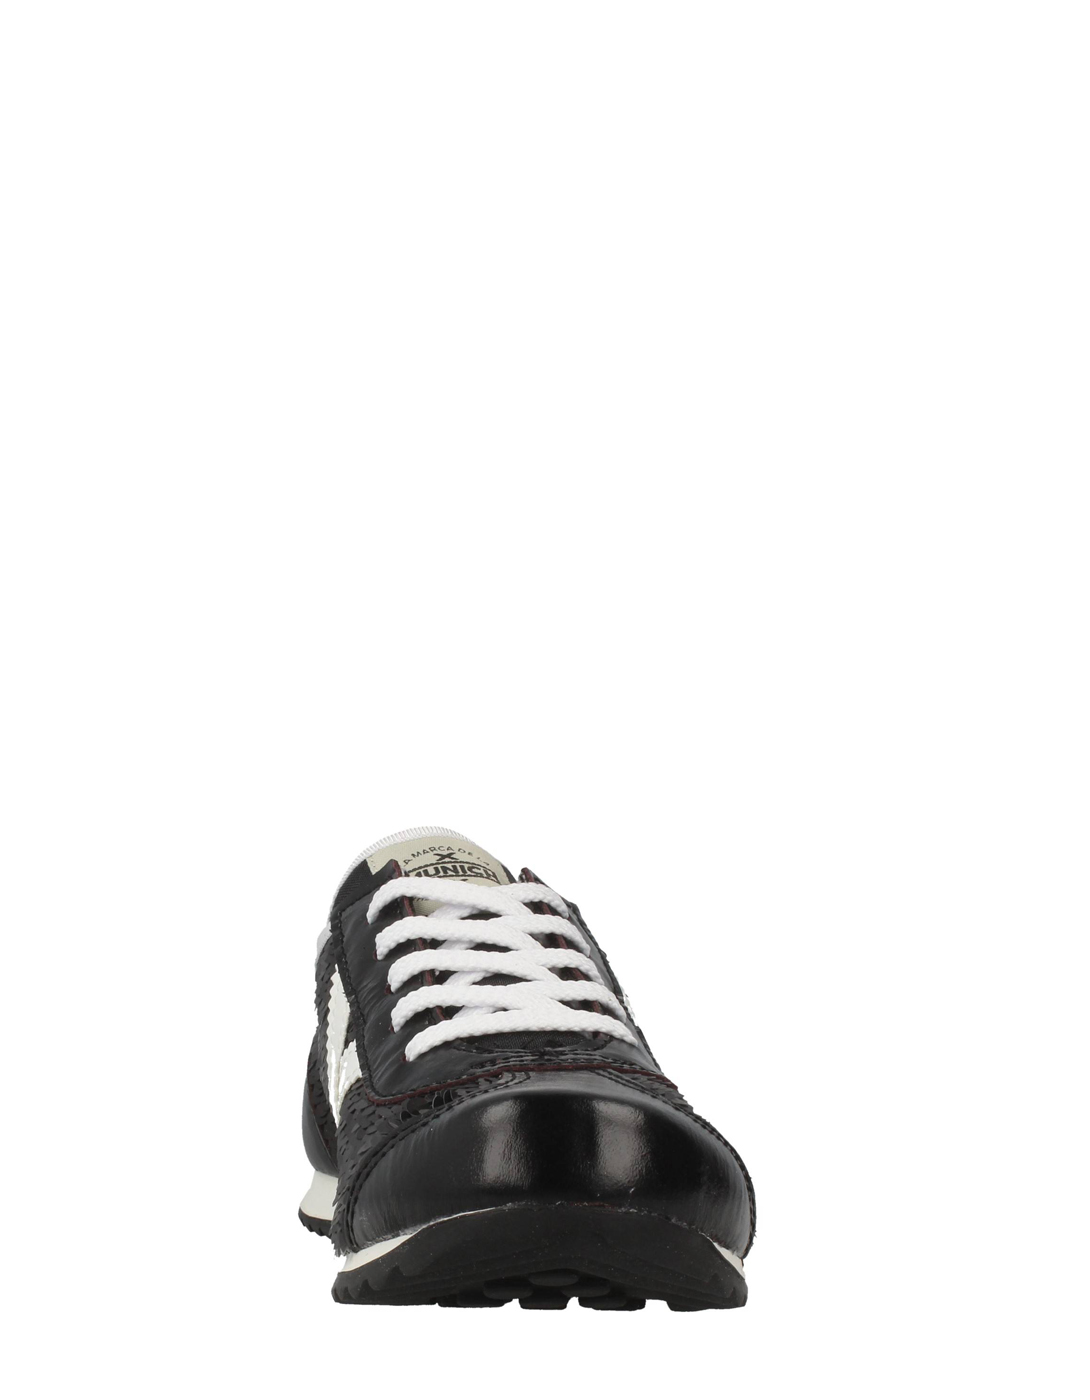 De En 264 Munich Negras Zapatillas Deportivas Mujer Zapatos Osaka BqvFS0